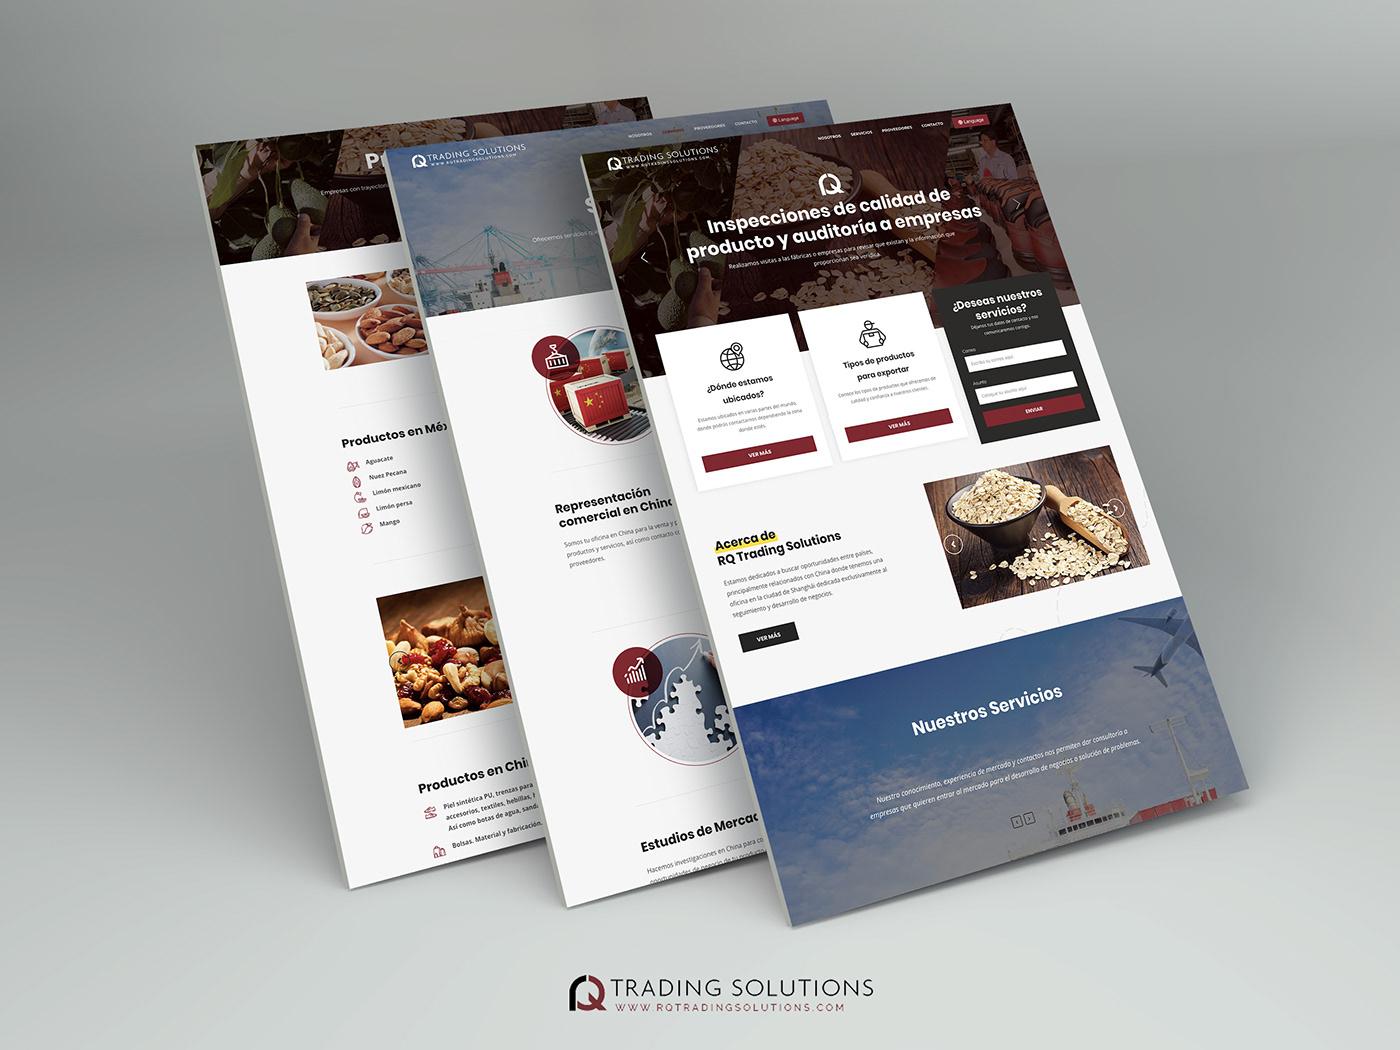 Image may contain: screenshot, book and poster